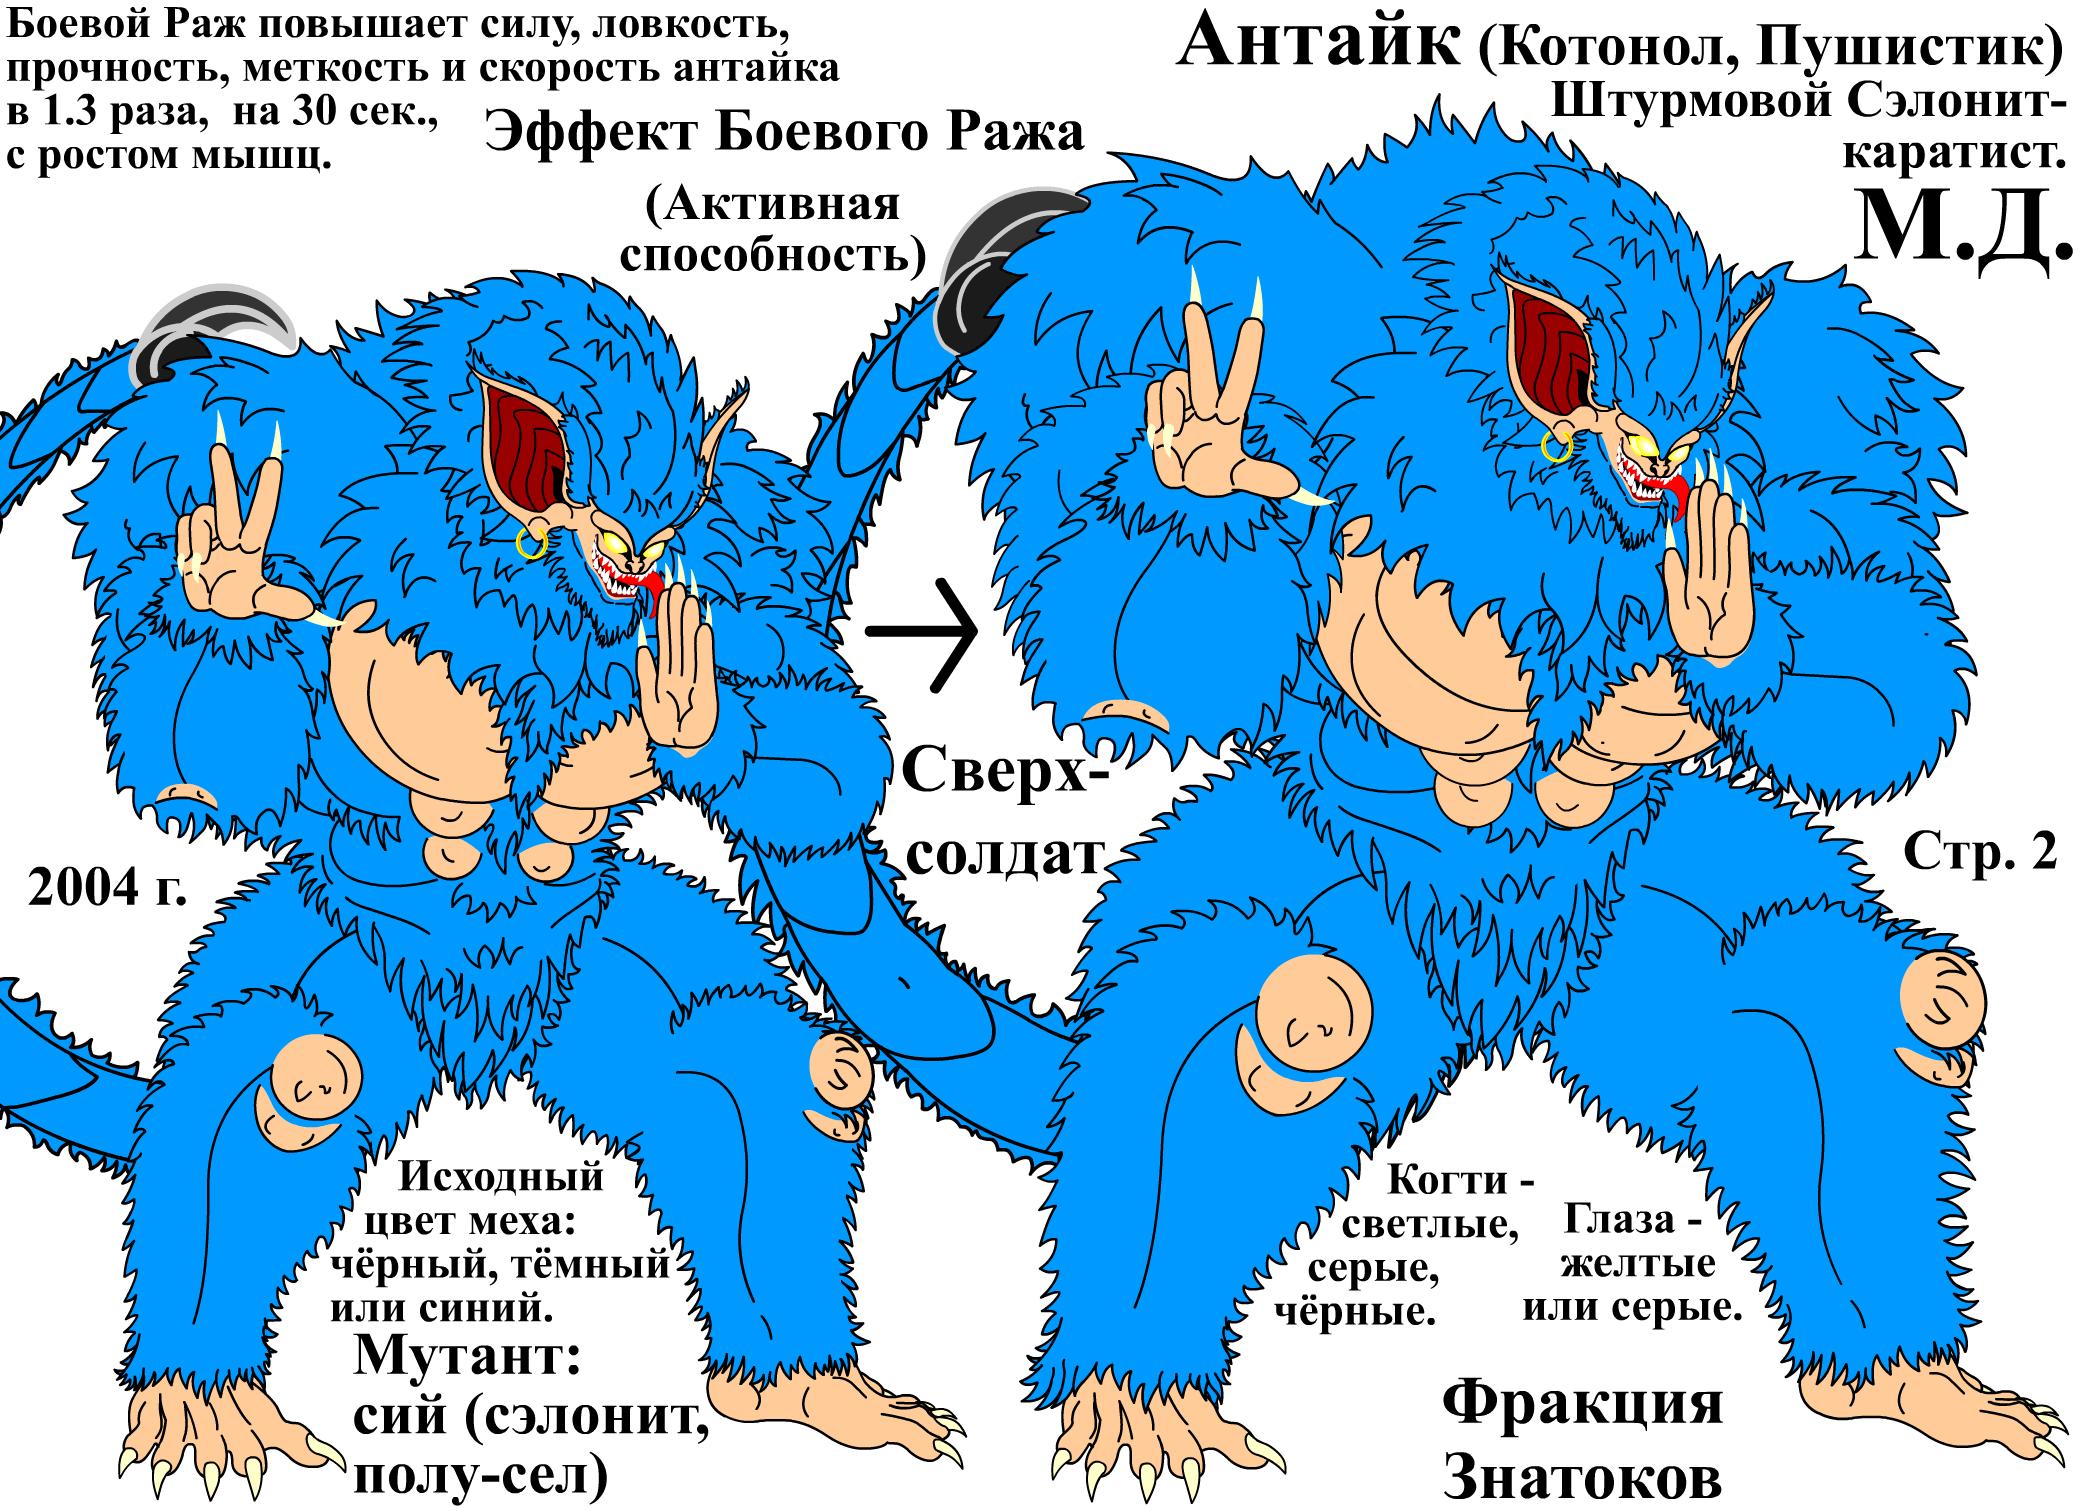 http://xgm.guru/p/blog-agren/xroniki-groev-chas-cyda-glava-cemi